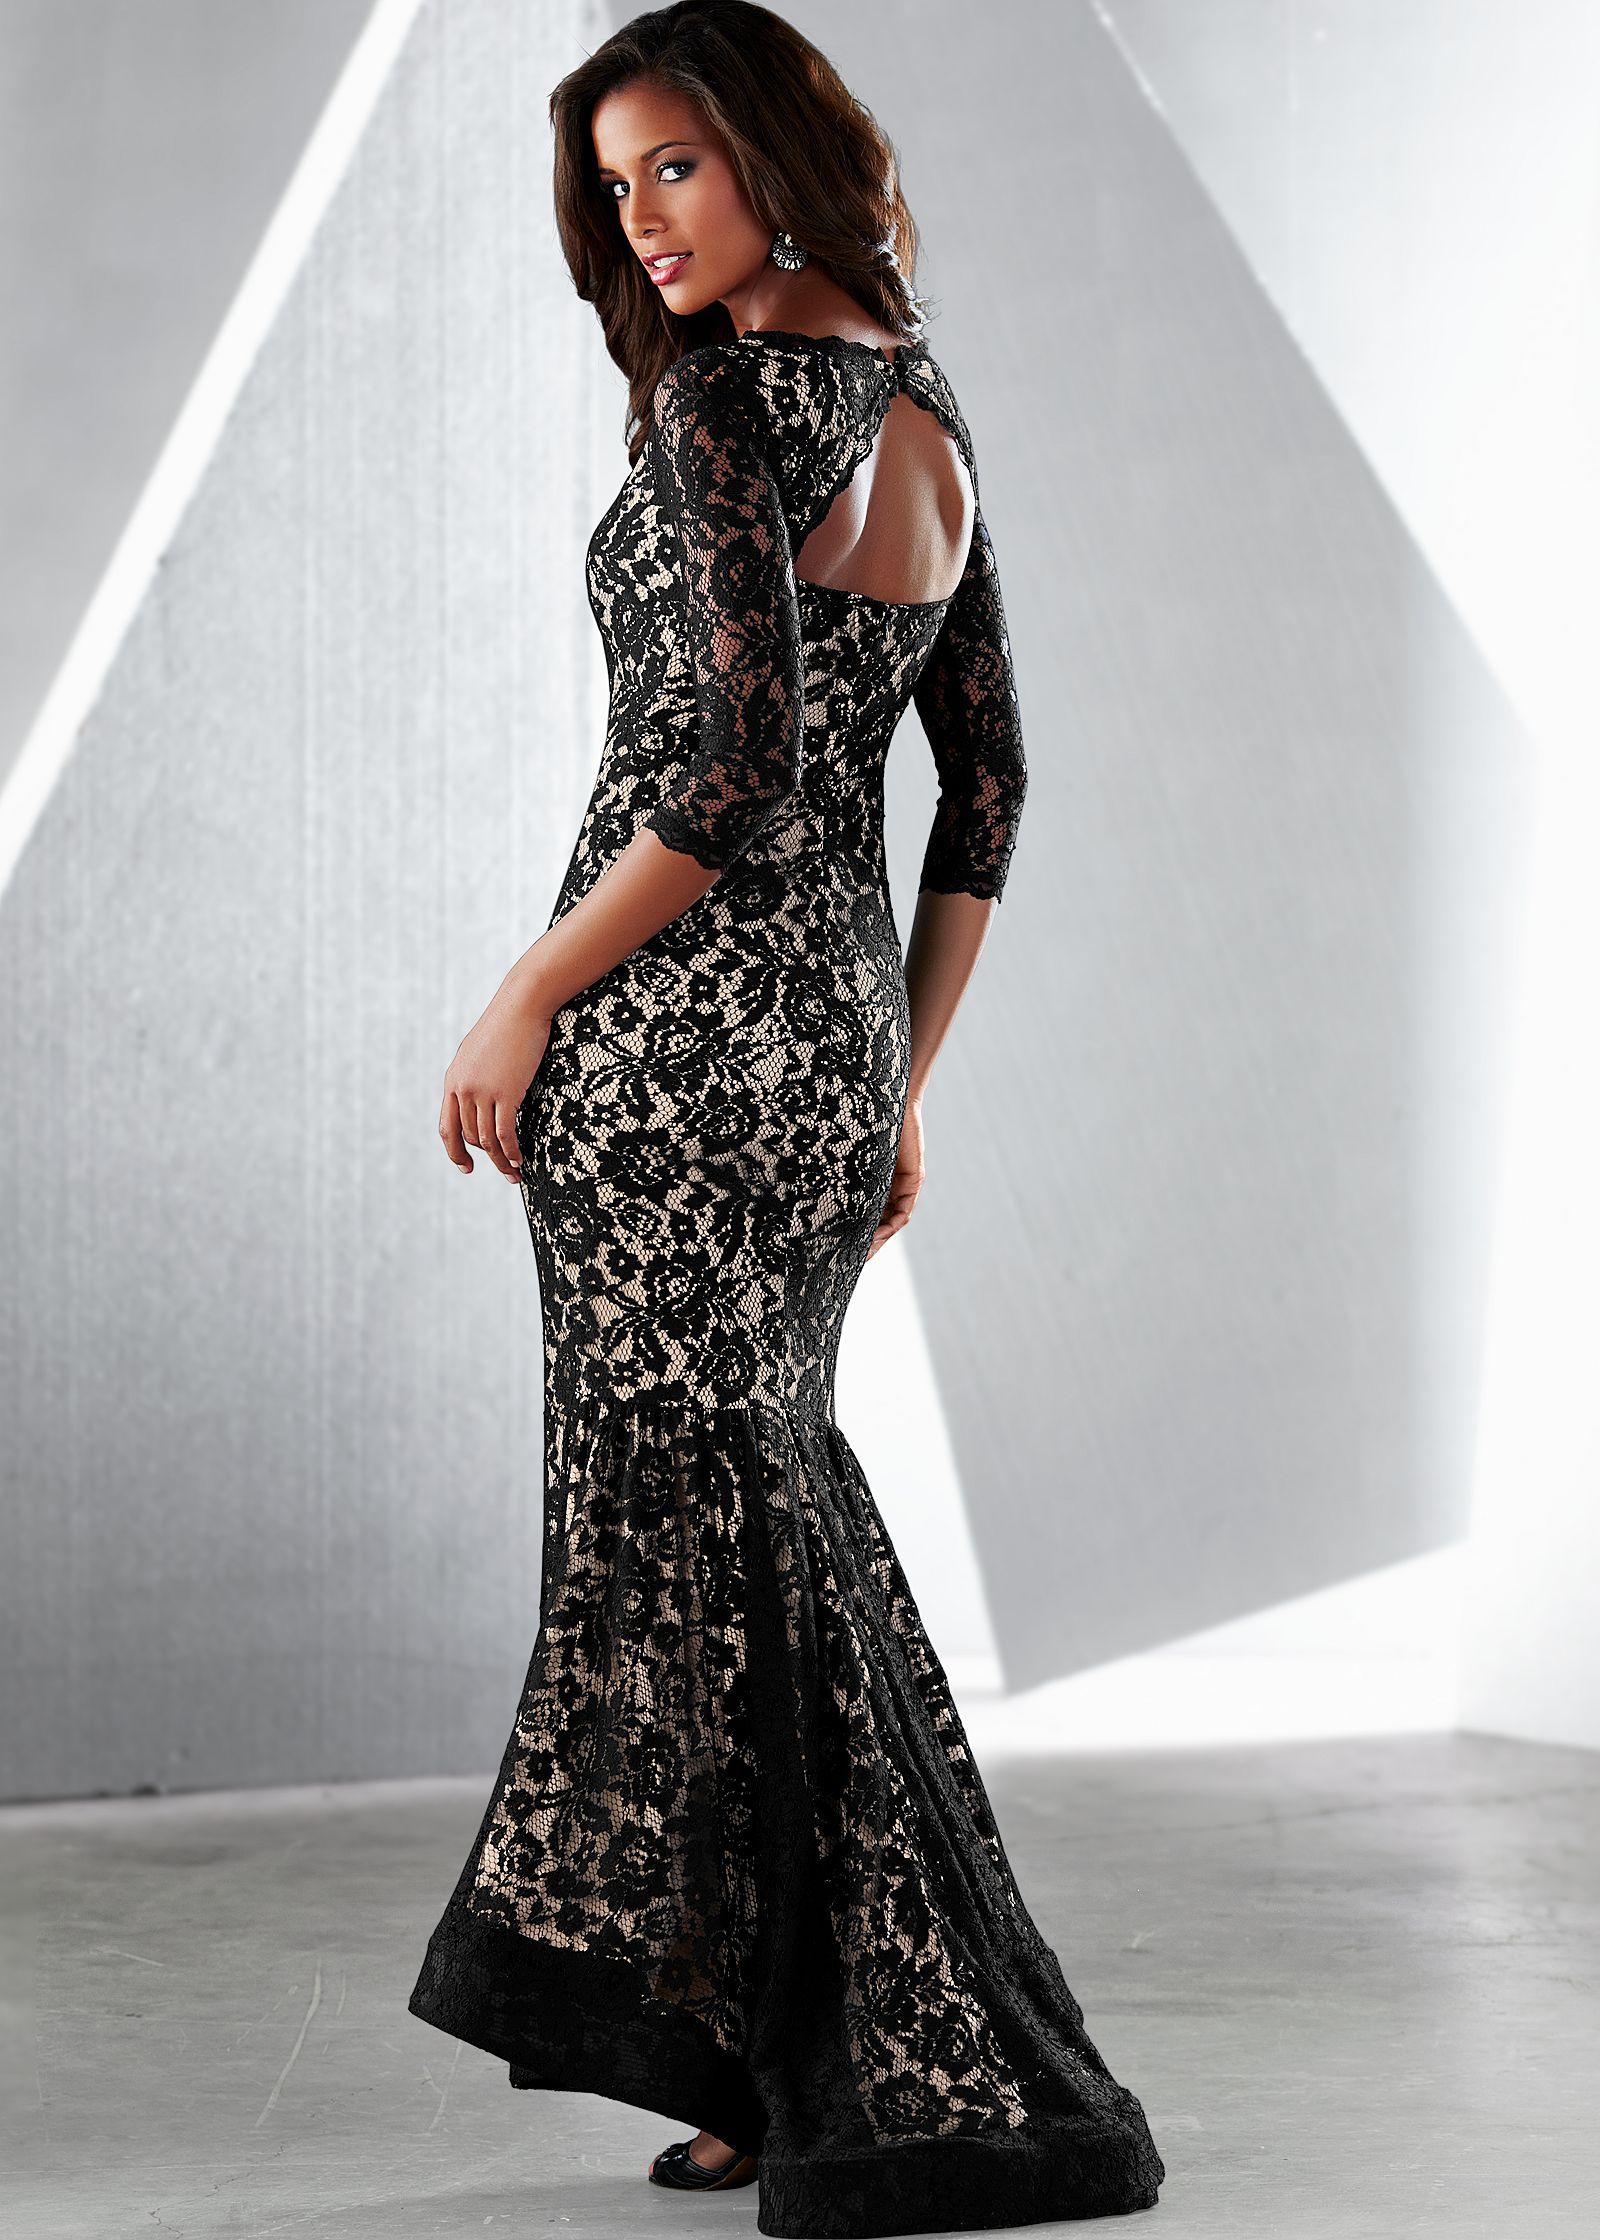 LONG LACE DRESS in Black Multi   VENUS